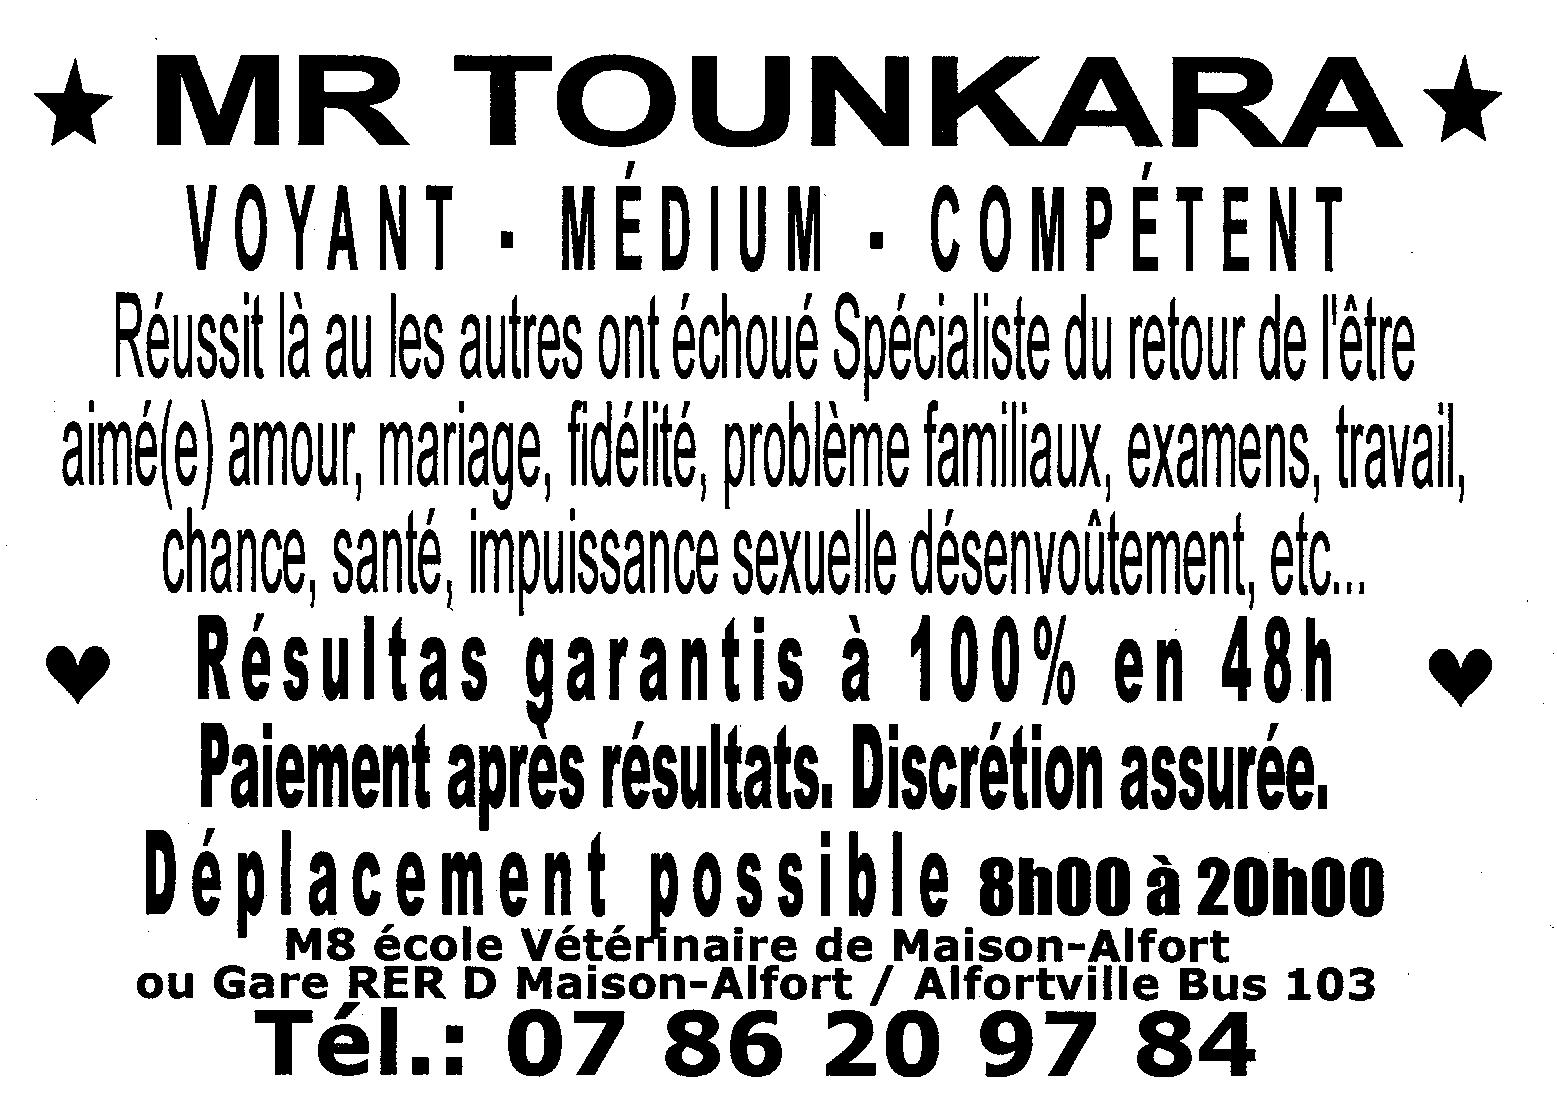 Mr Tounkara